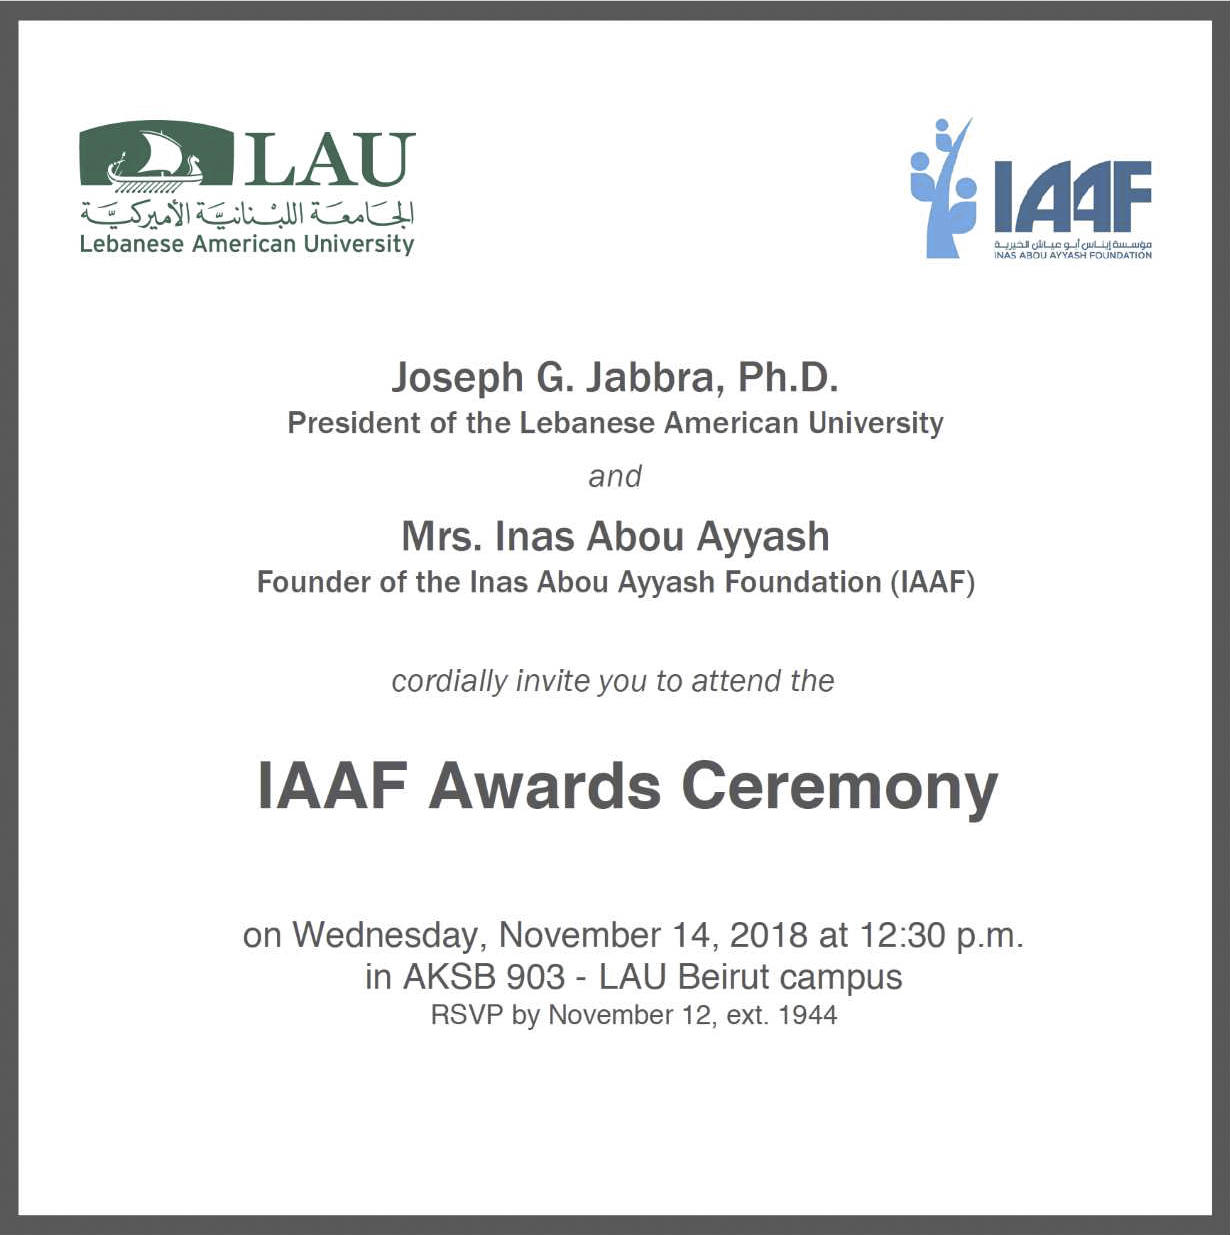 IAAF-Awards-Ceremony-2018-poster.jpg